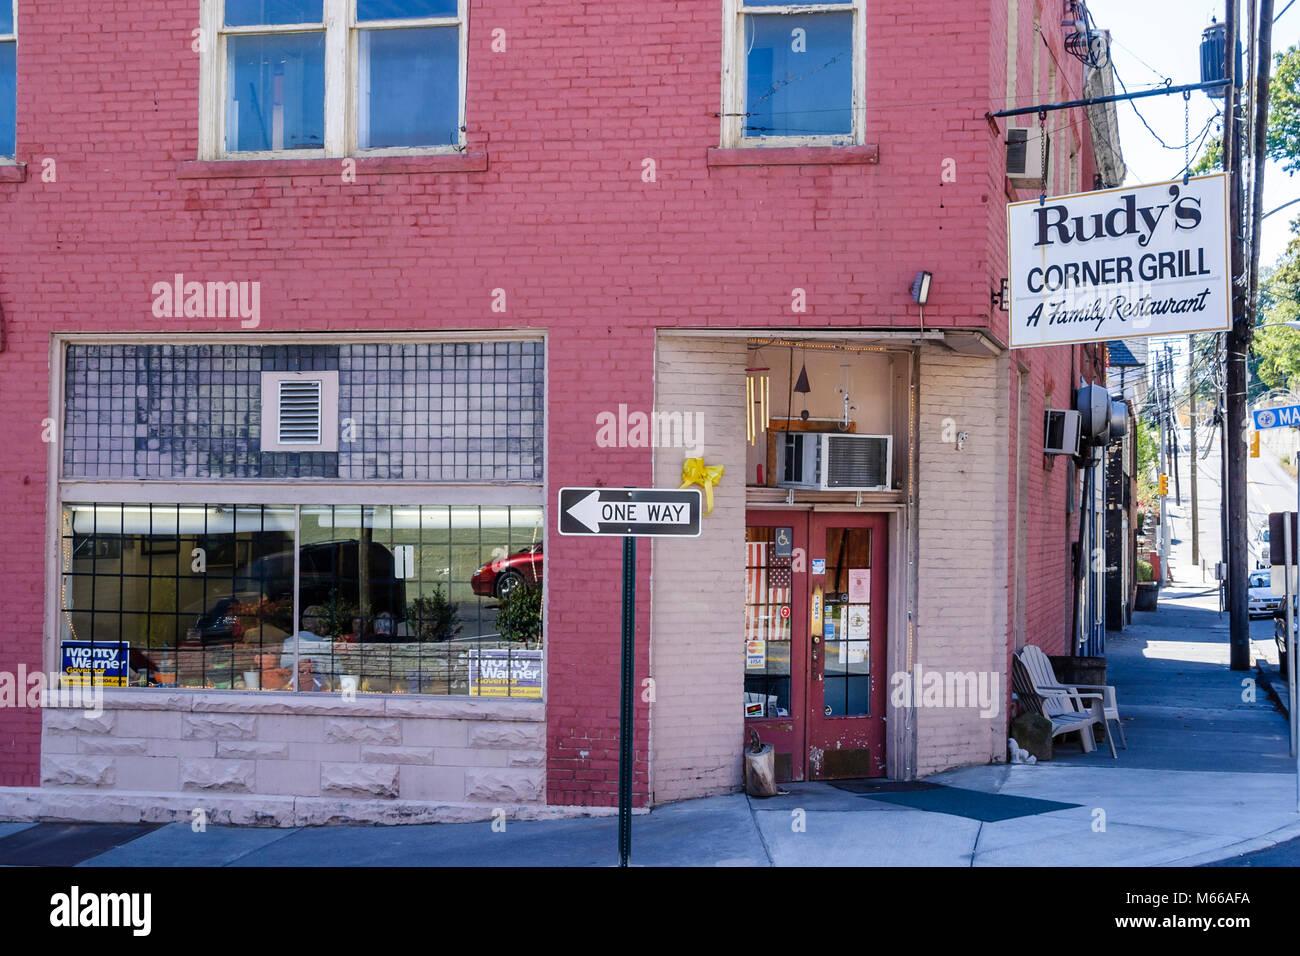 Rudys Stockfotos & Rudys Bilder - Alamy